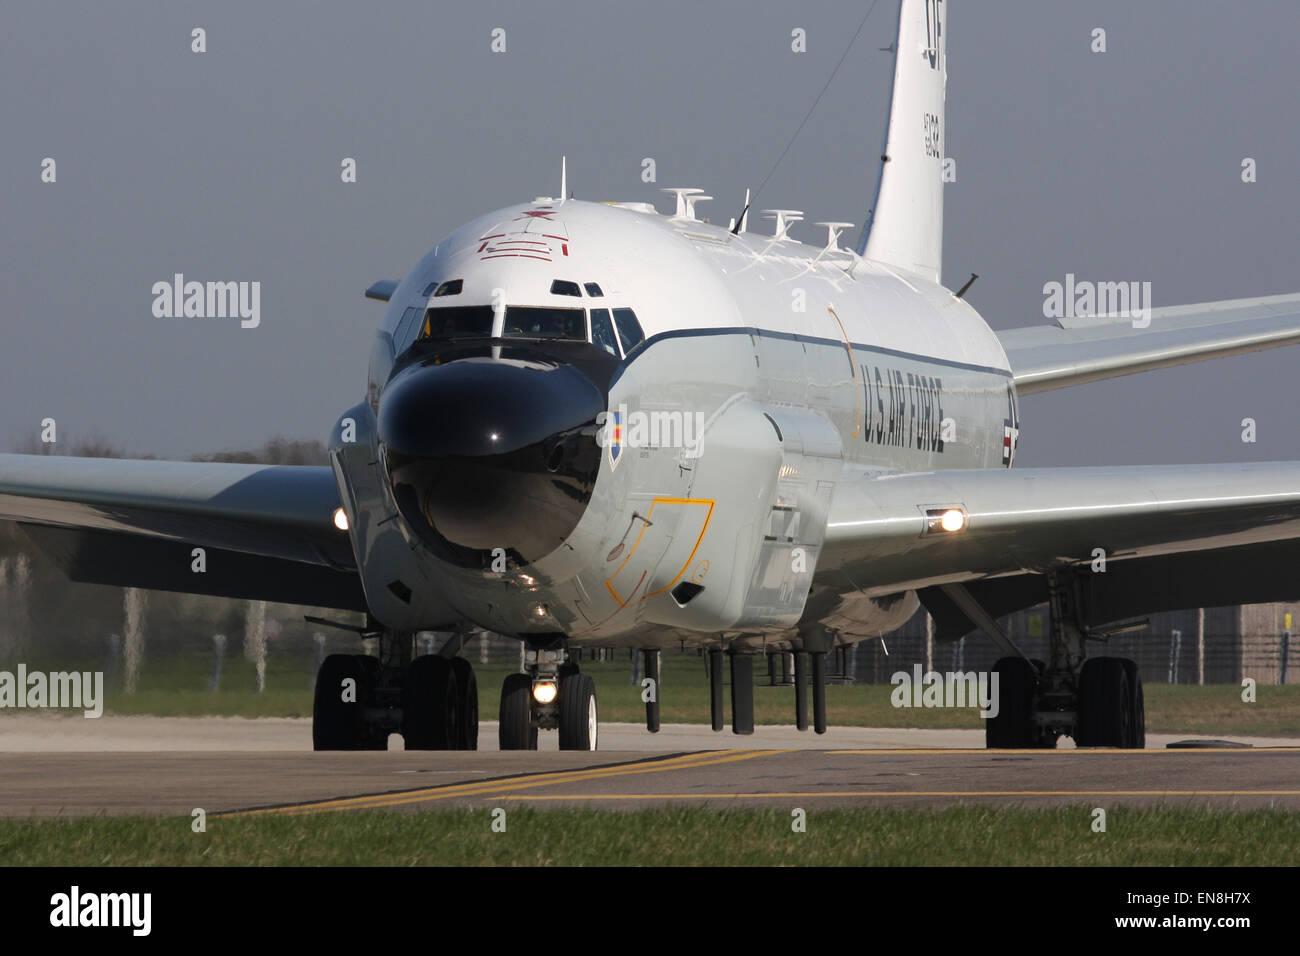 uns air Force USAF rc135w Rivet joint Stockbild